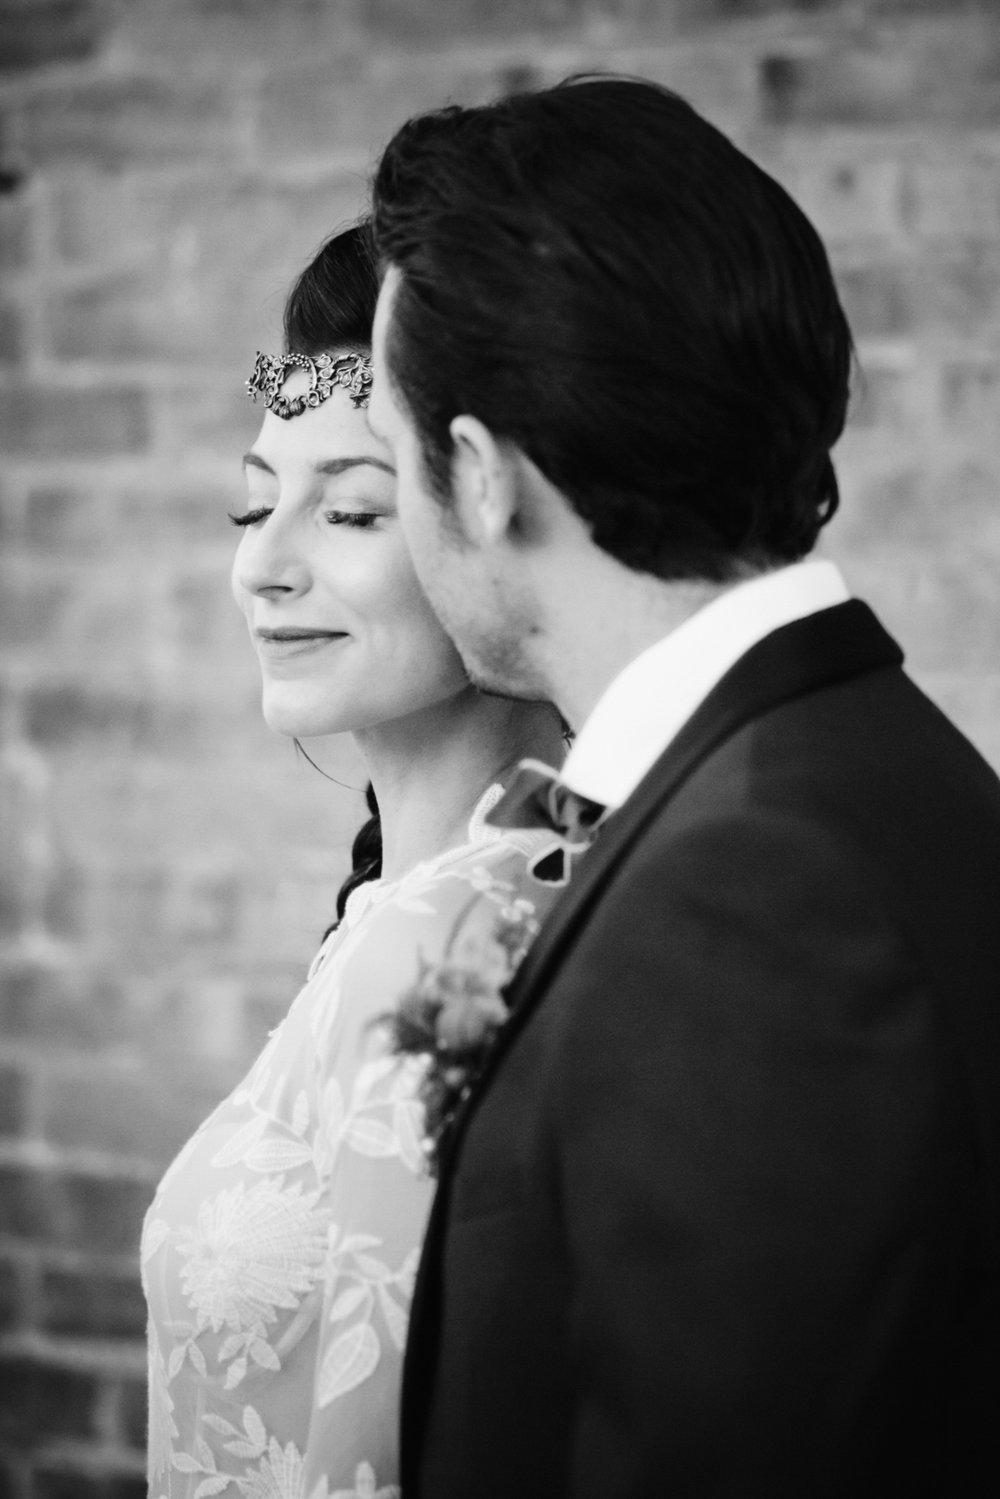 Kimberly-Coccagnia-Wedding-Photographer-140.JPG